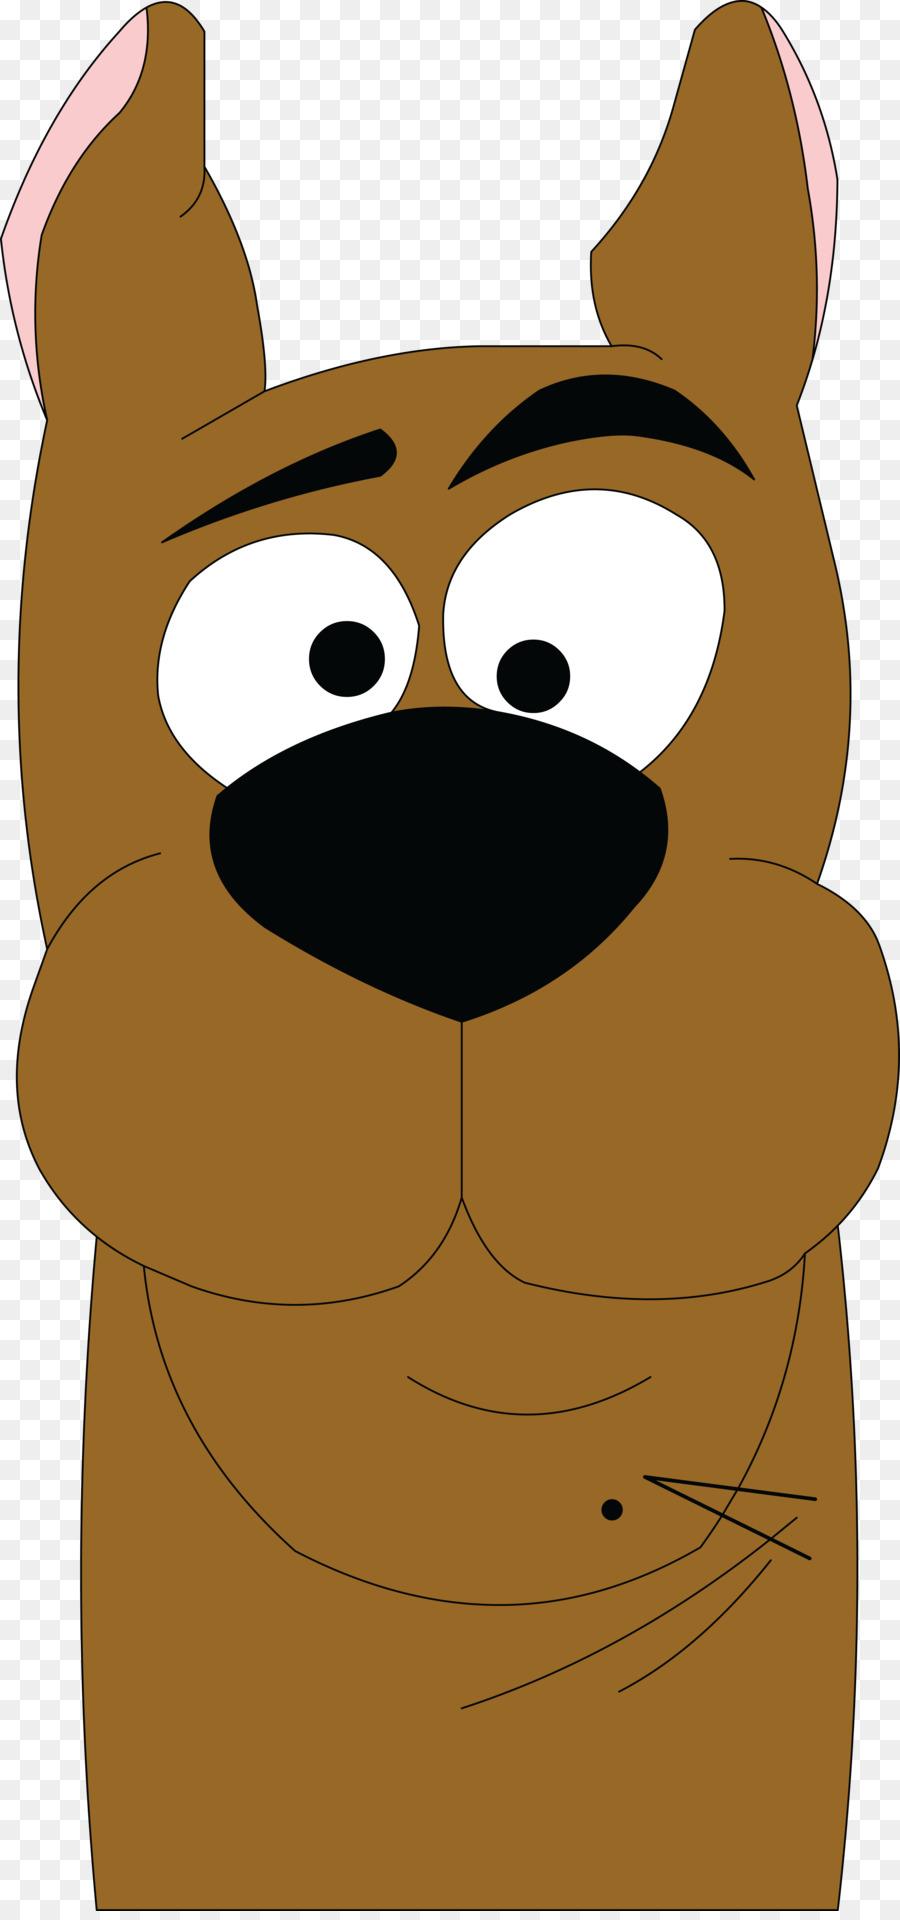 900x1920 Scooby Doo Clip Art